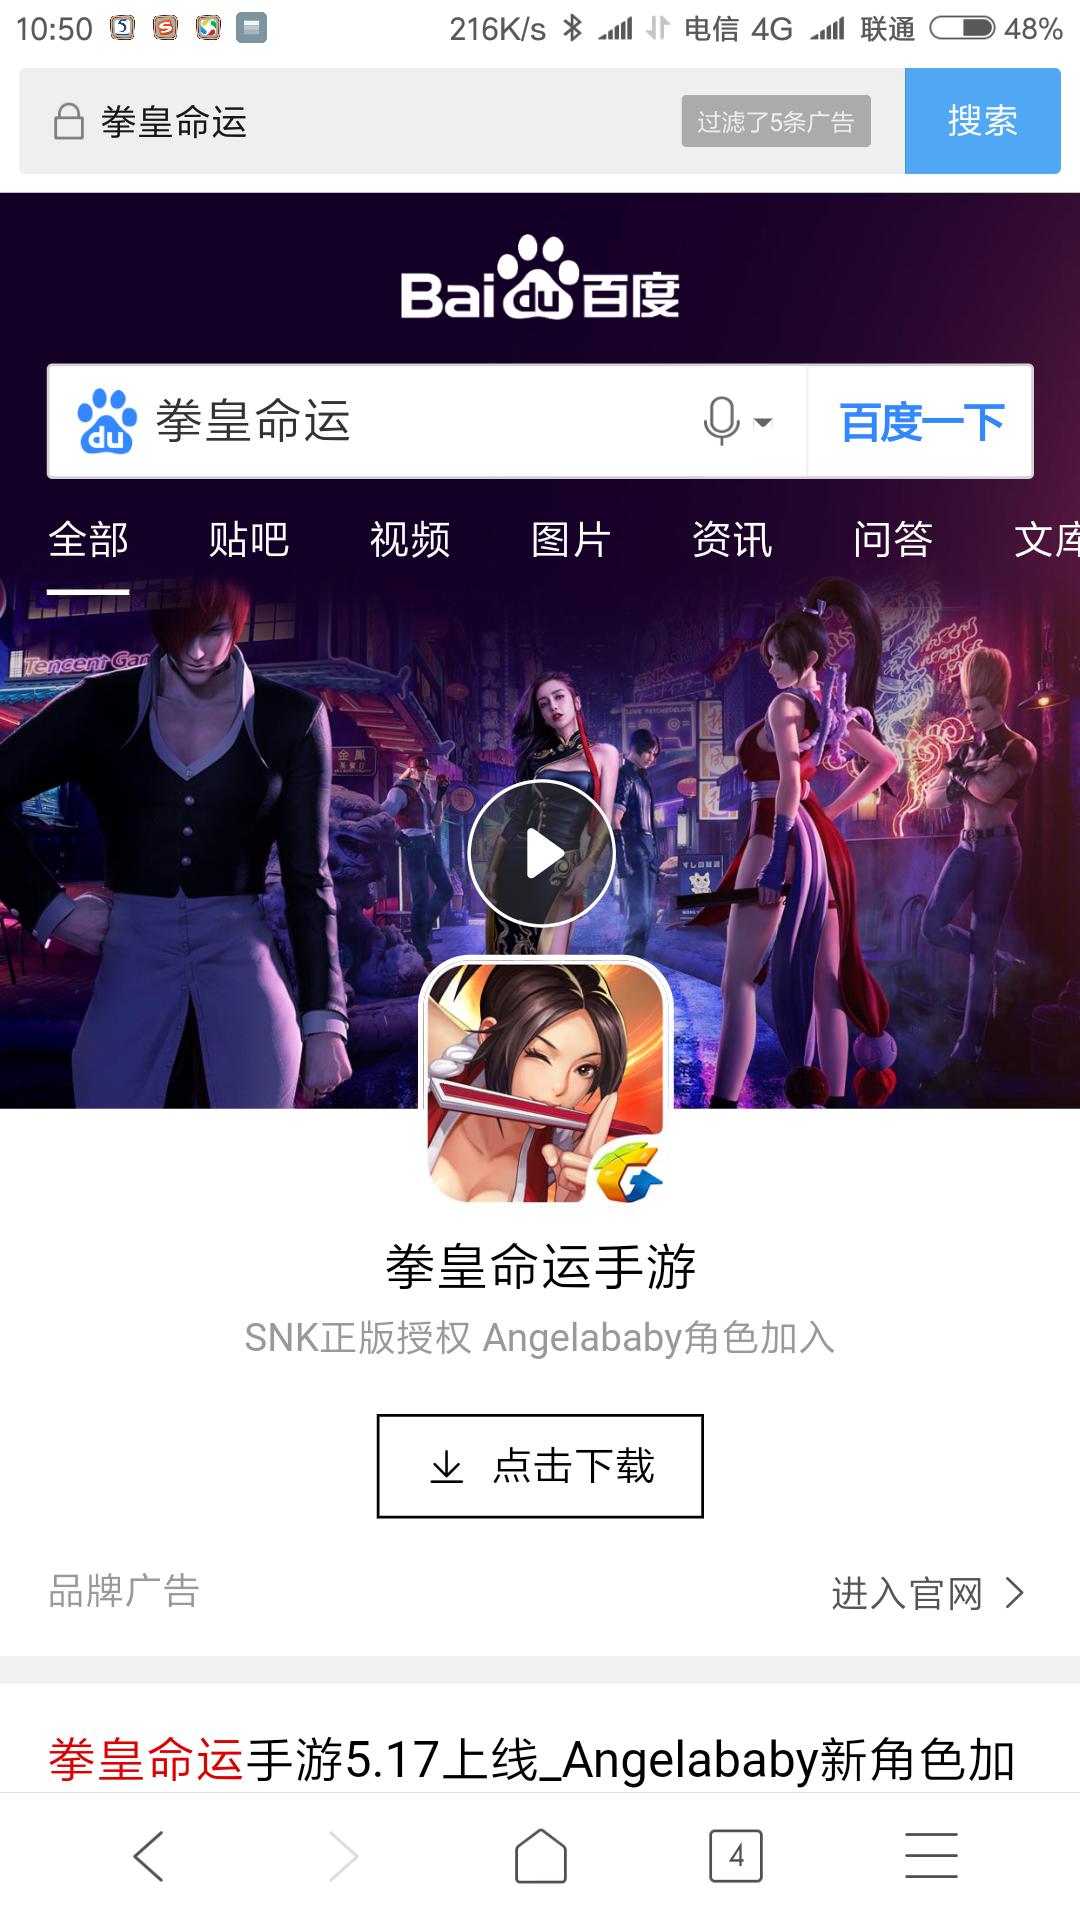 Screenshot_2018-06-30-10-50-25-468_com.android.br.png